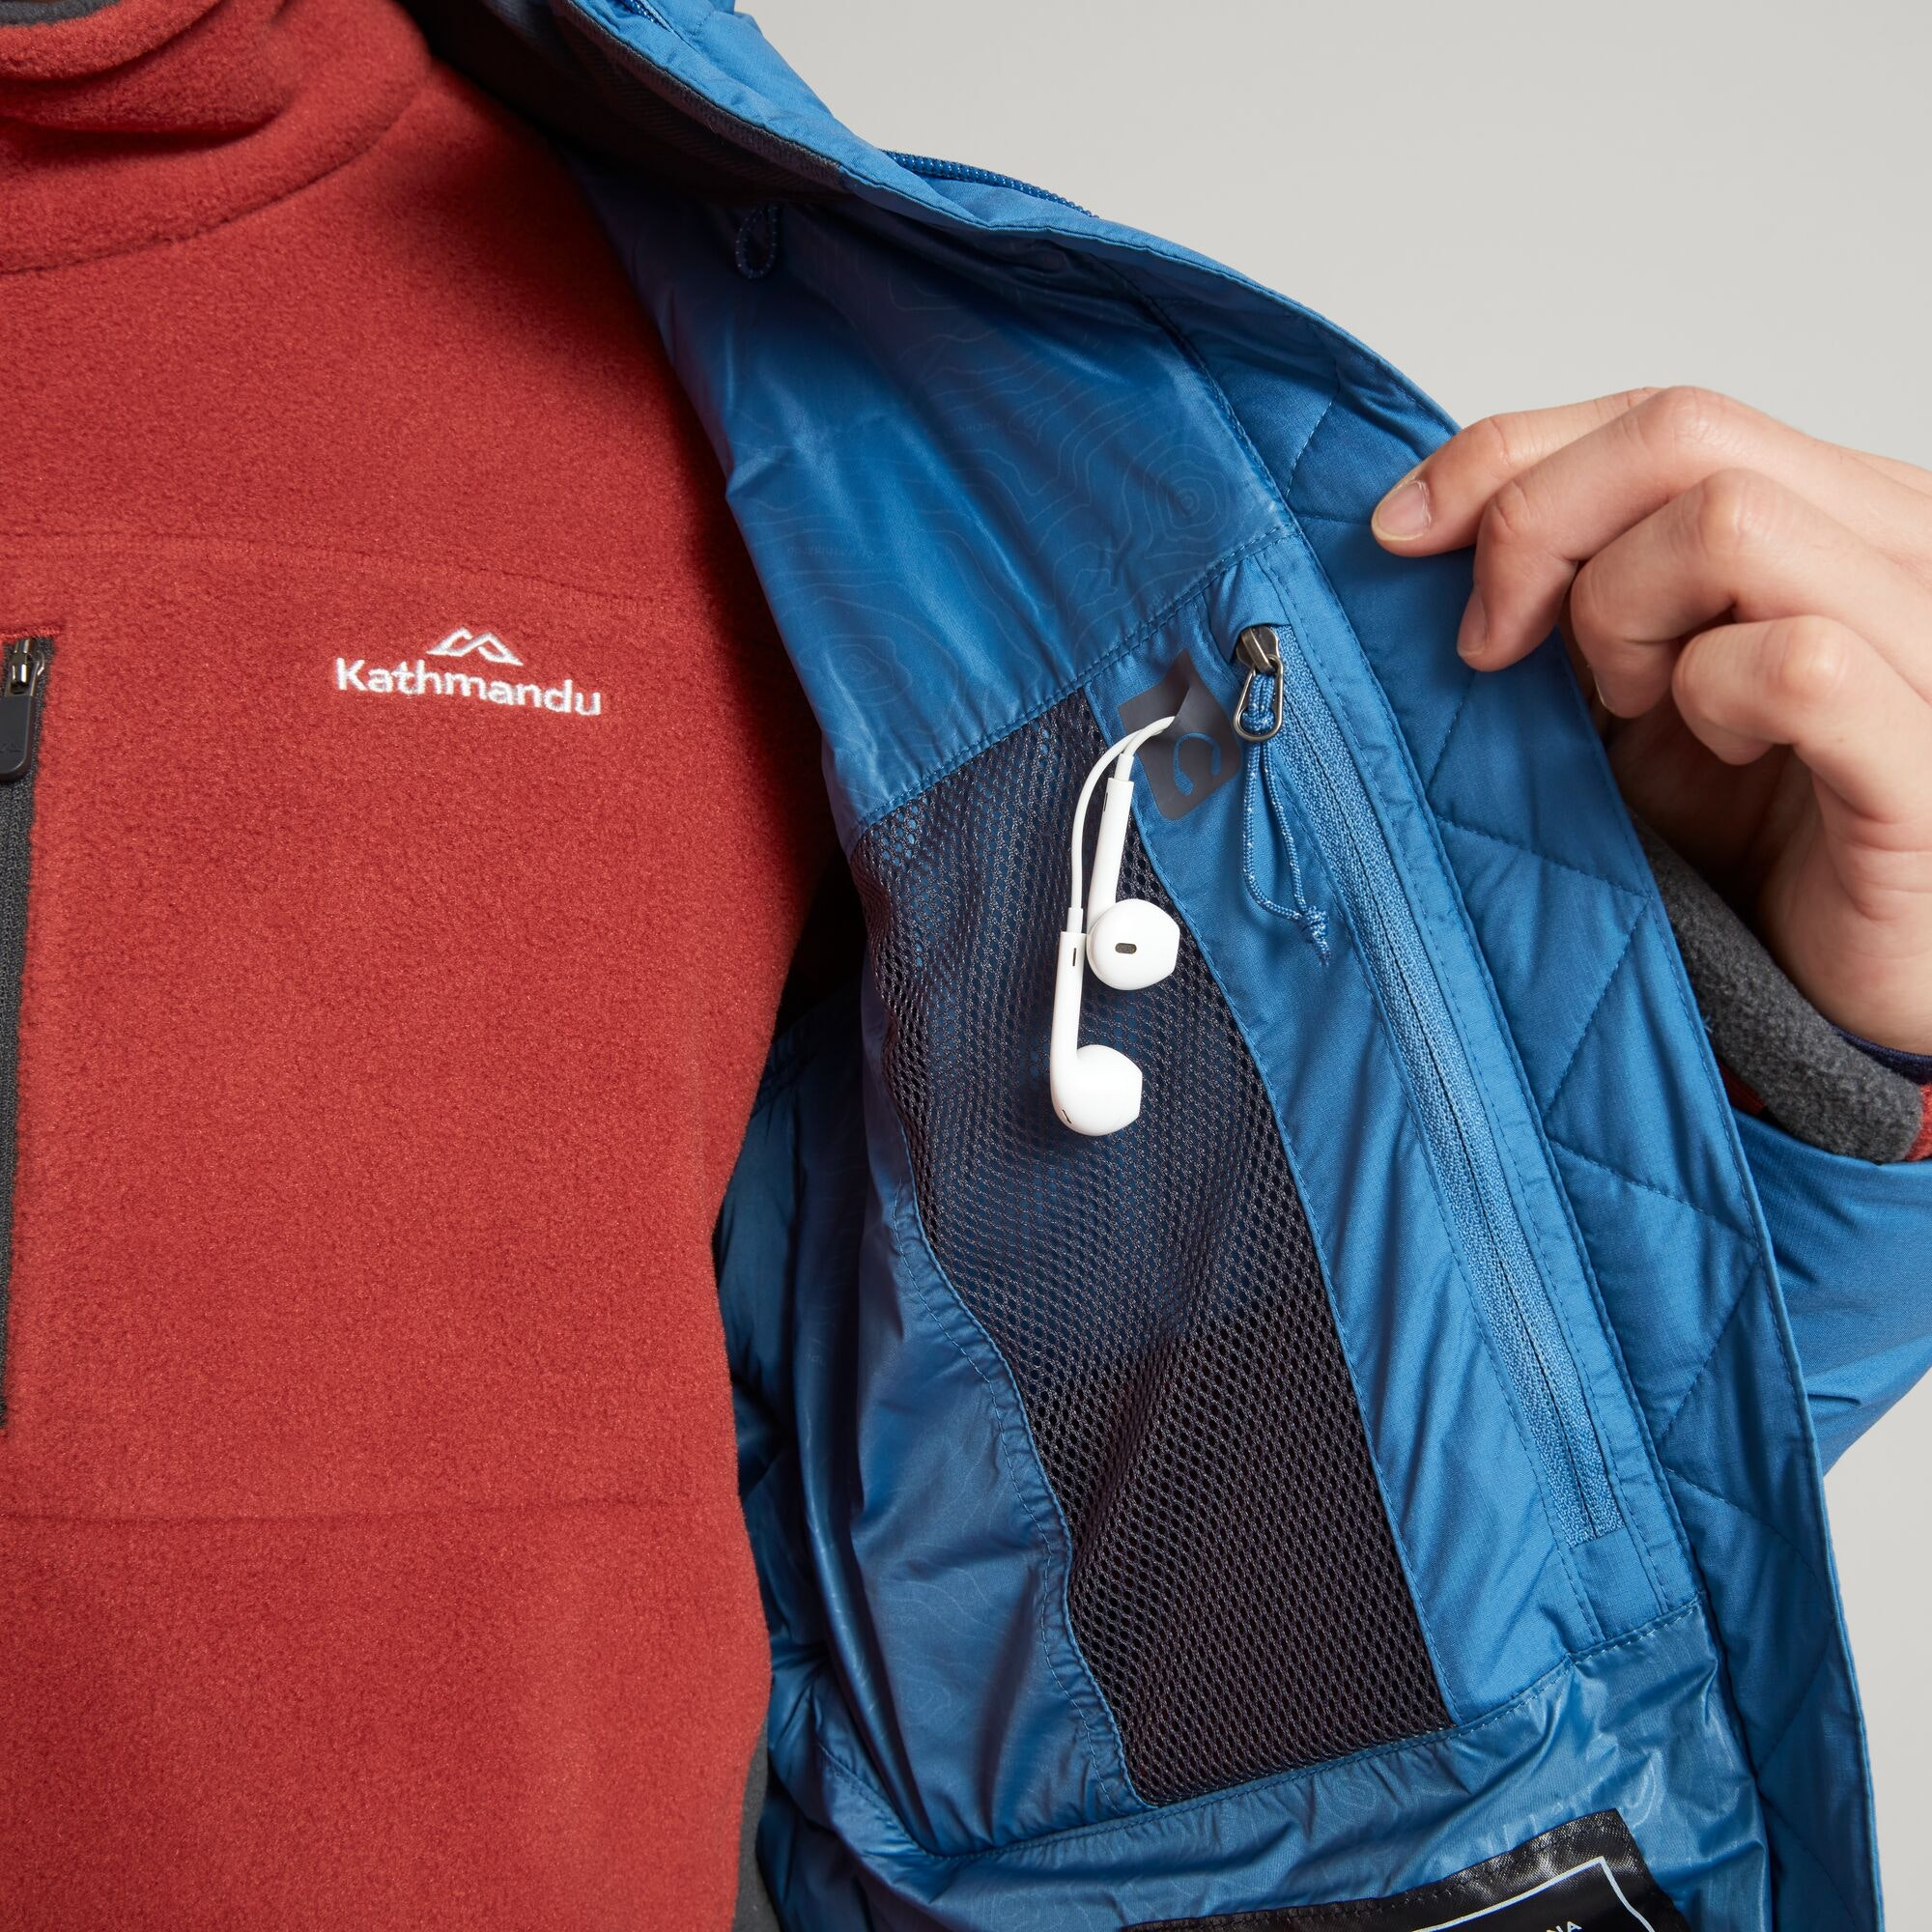 thumbnail 26 - NEW Kathmandu Epiq Mens 600 Fill Down Puffer Warm Outdoor Winter Jacket